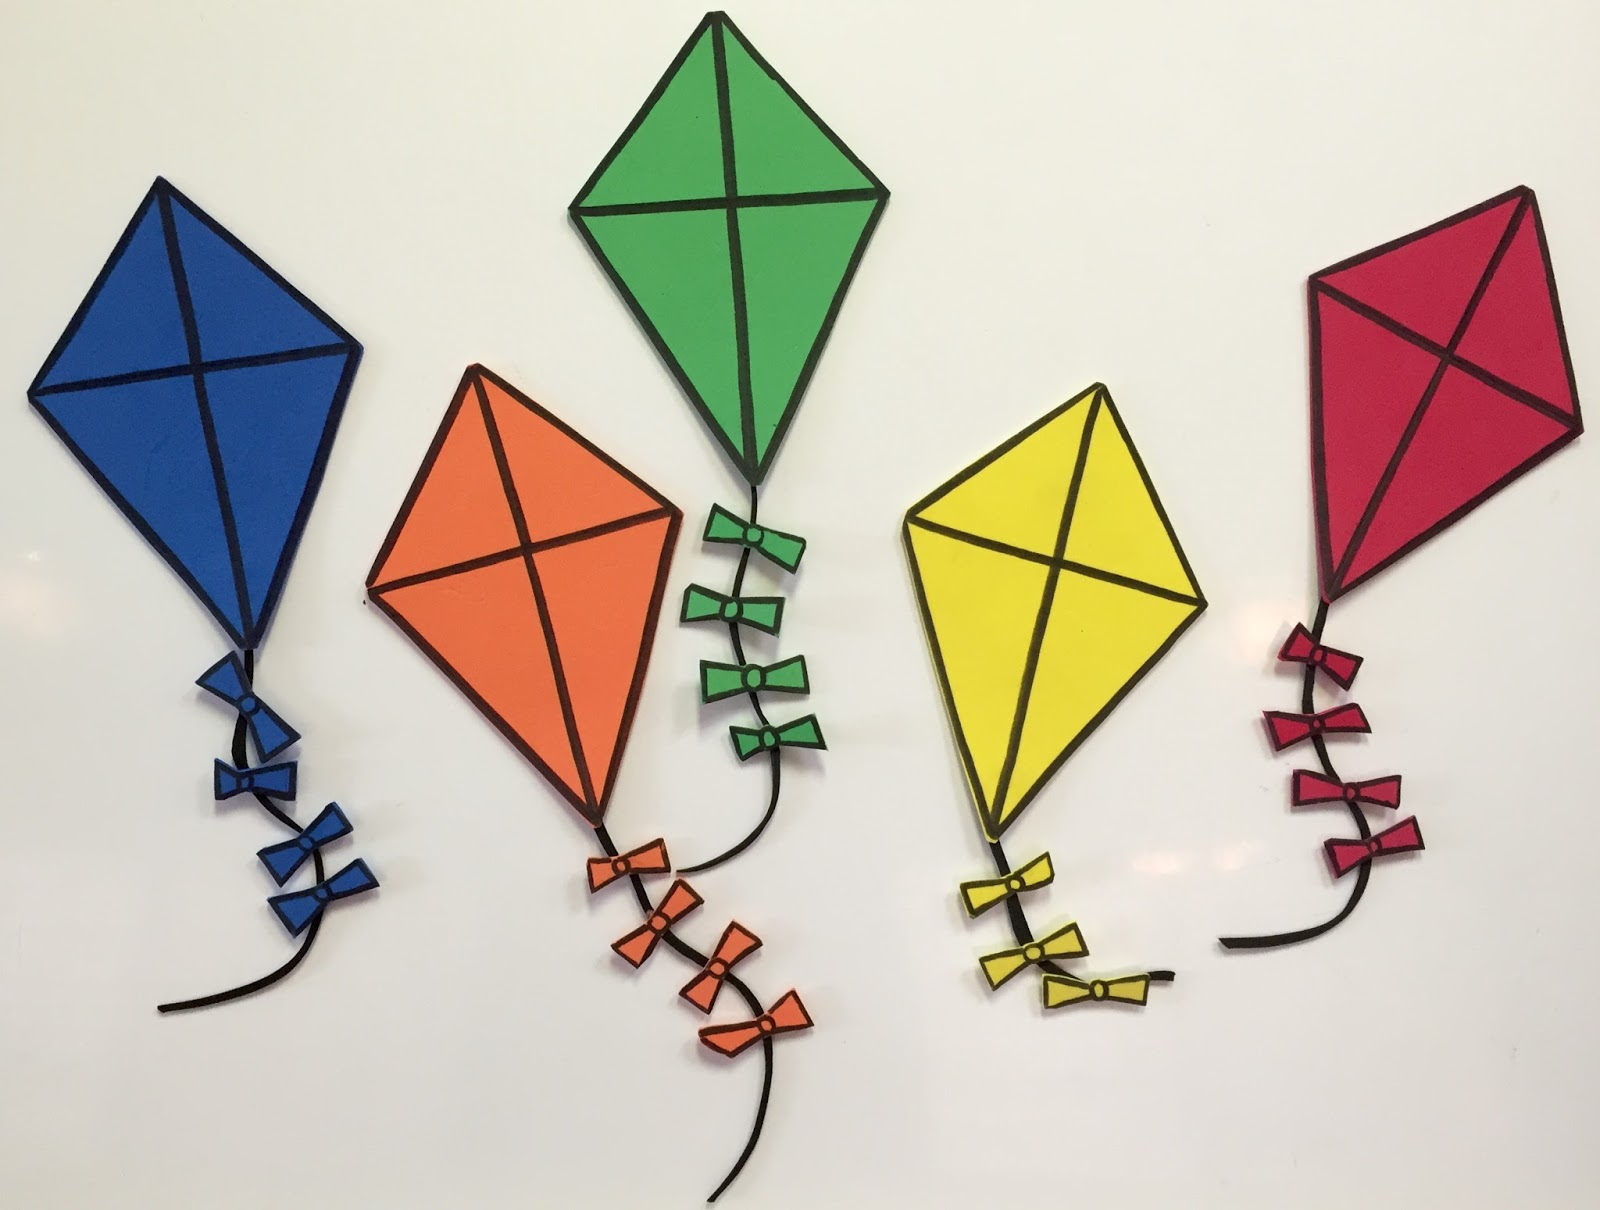 Free download clip art. Clipart kite three